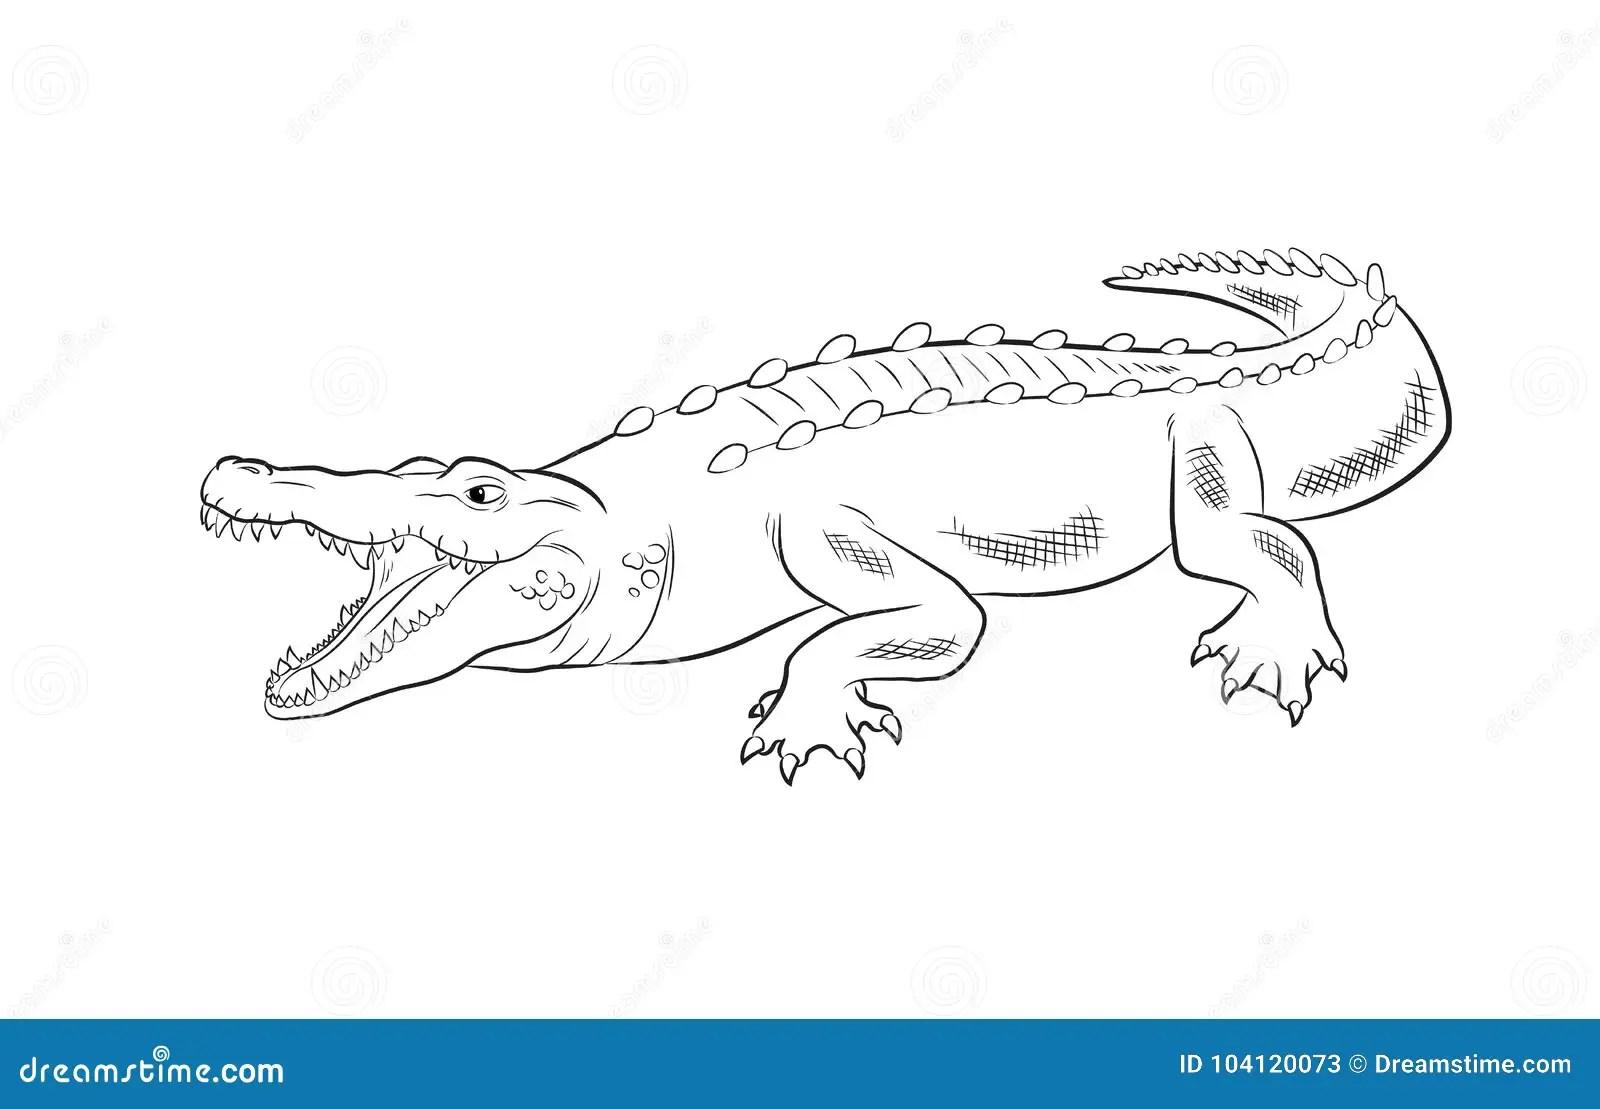 Crocodile Drawing Vector Illustration Stock Vector